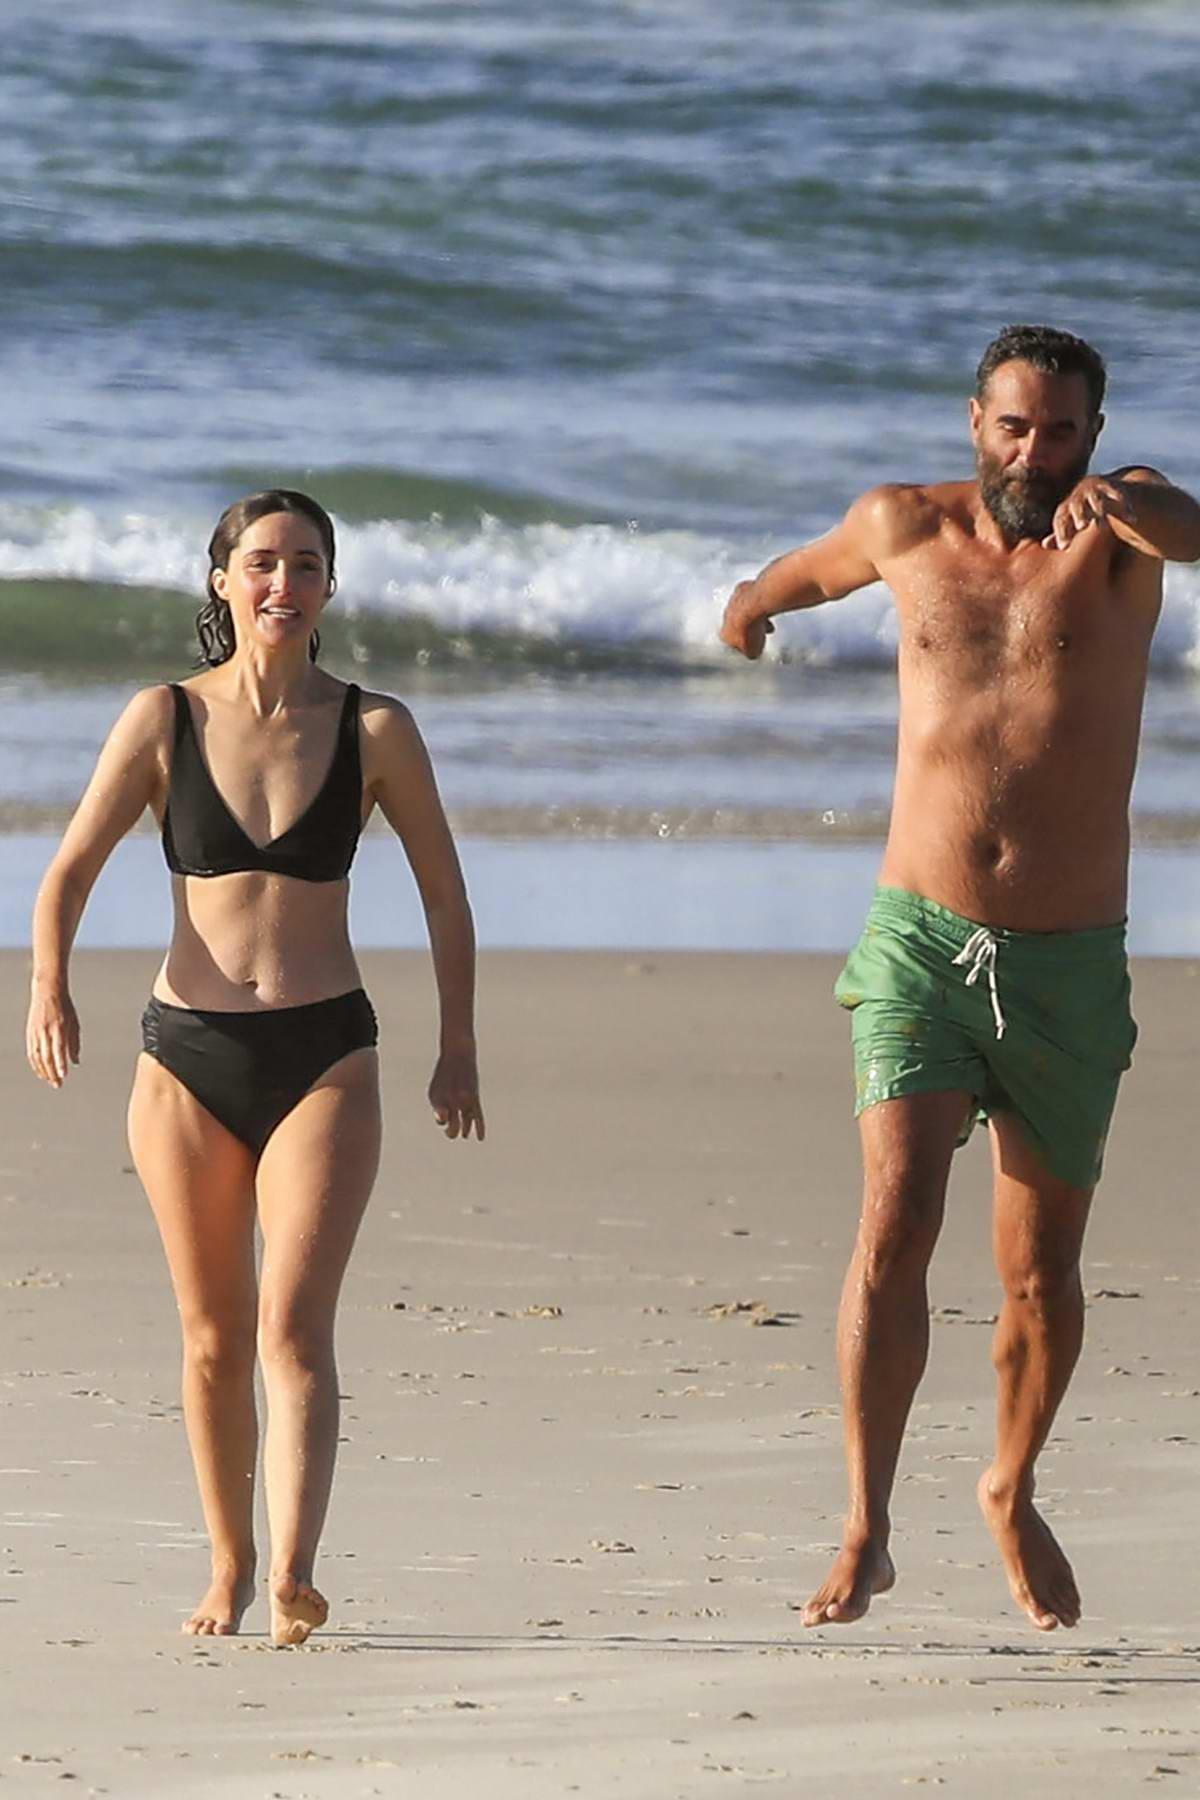 Rose Byrne looks great in a black bikini while enjoying a beach day with Bobby Cannavale in Byron Bay, Australia